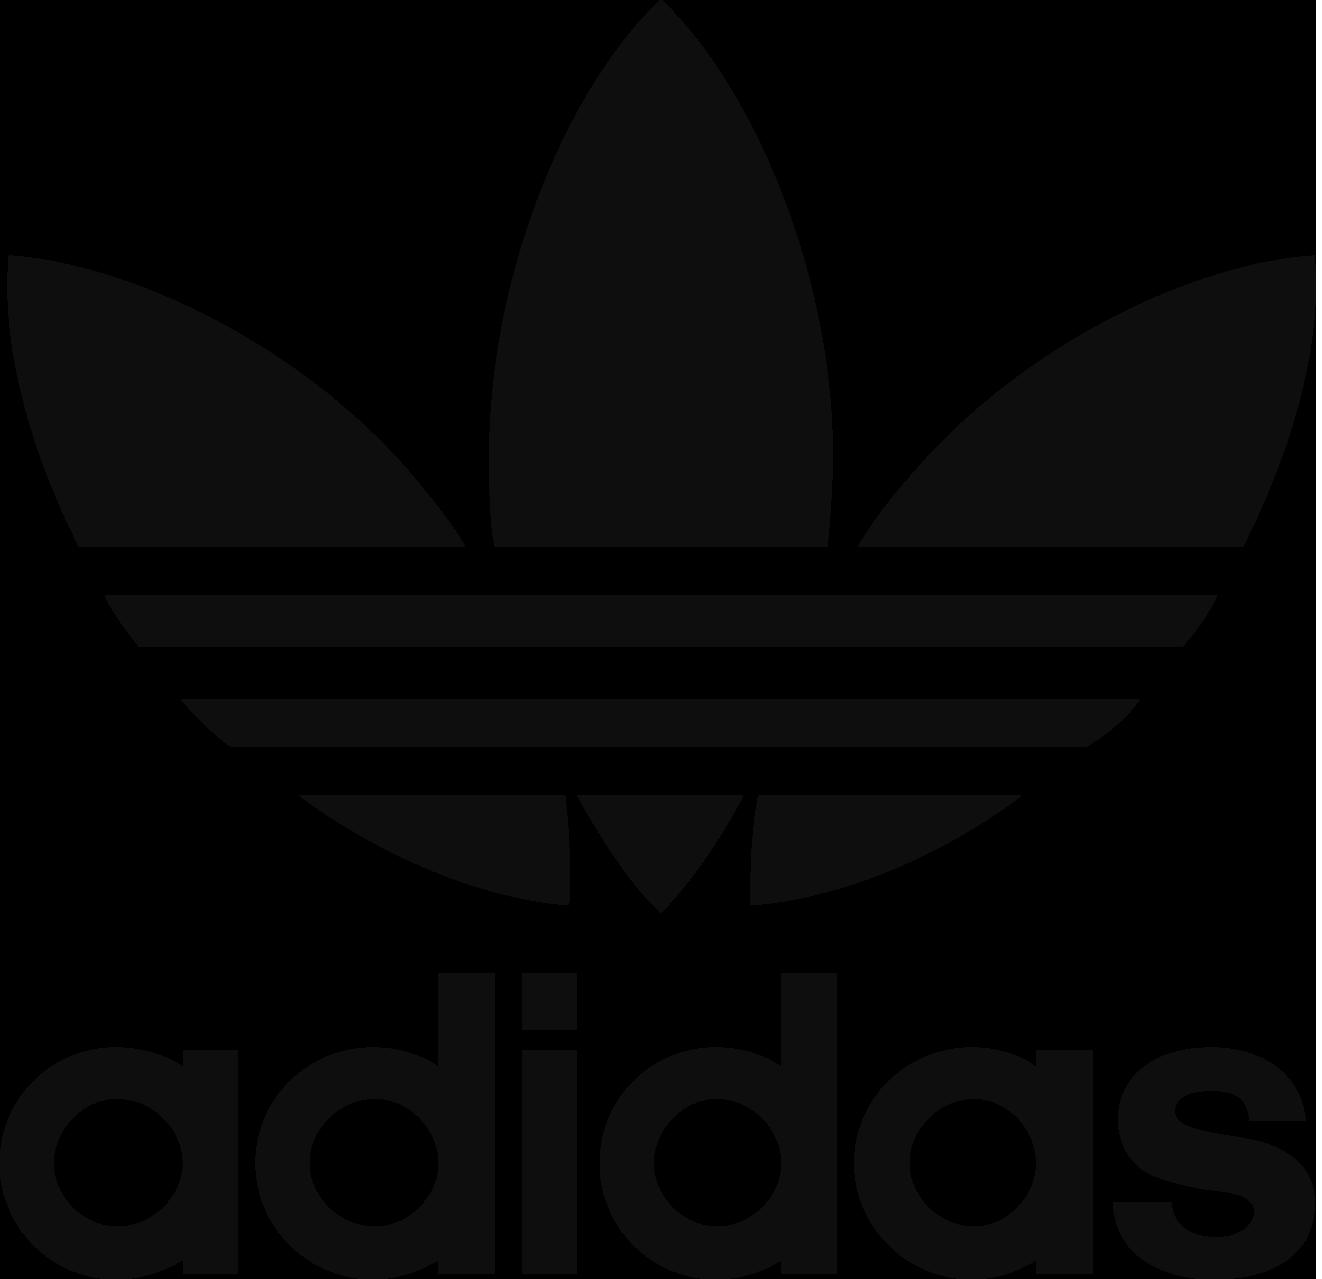 Adidas Falcon Zip Trainers Yellow Shoes Arket Adidas Originals Logo Adidas Logo Wallpapers Clothing Brand Logos